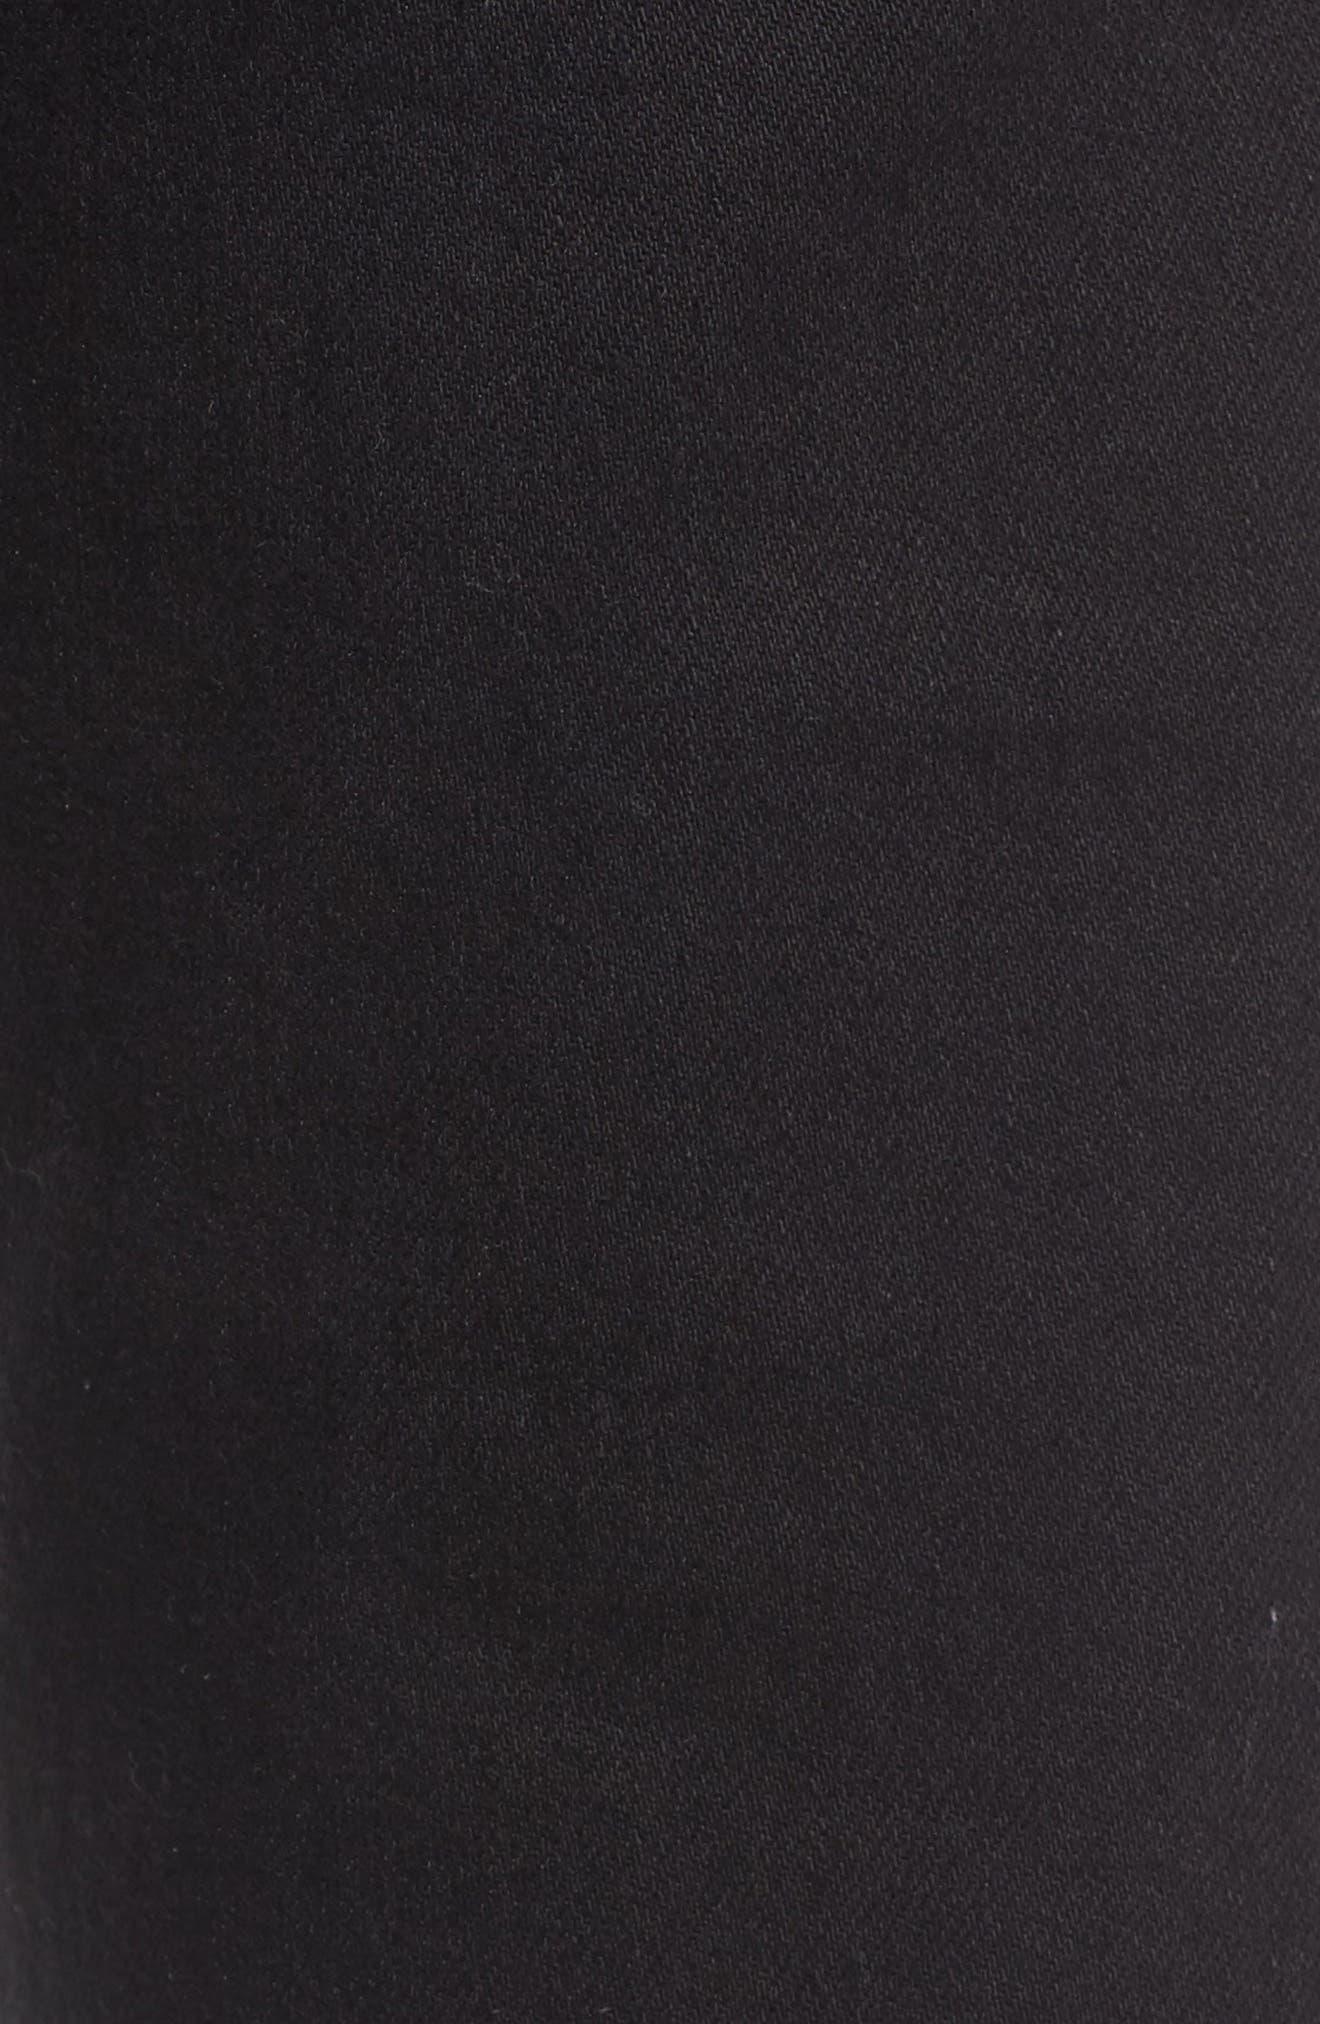 Juvee II Skinny Fit Jeans,                             Alternate thumbnail 5, color,                             Black